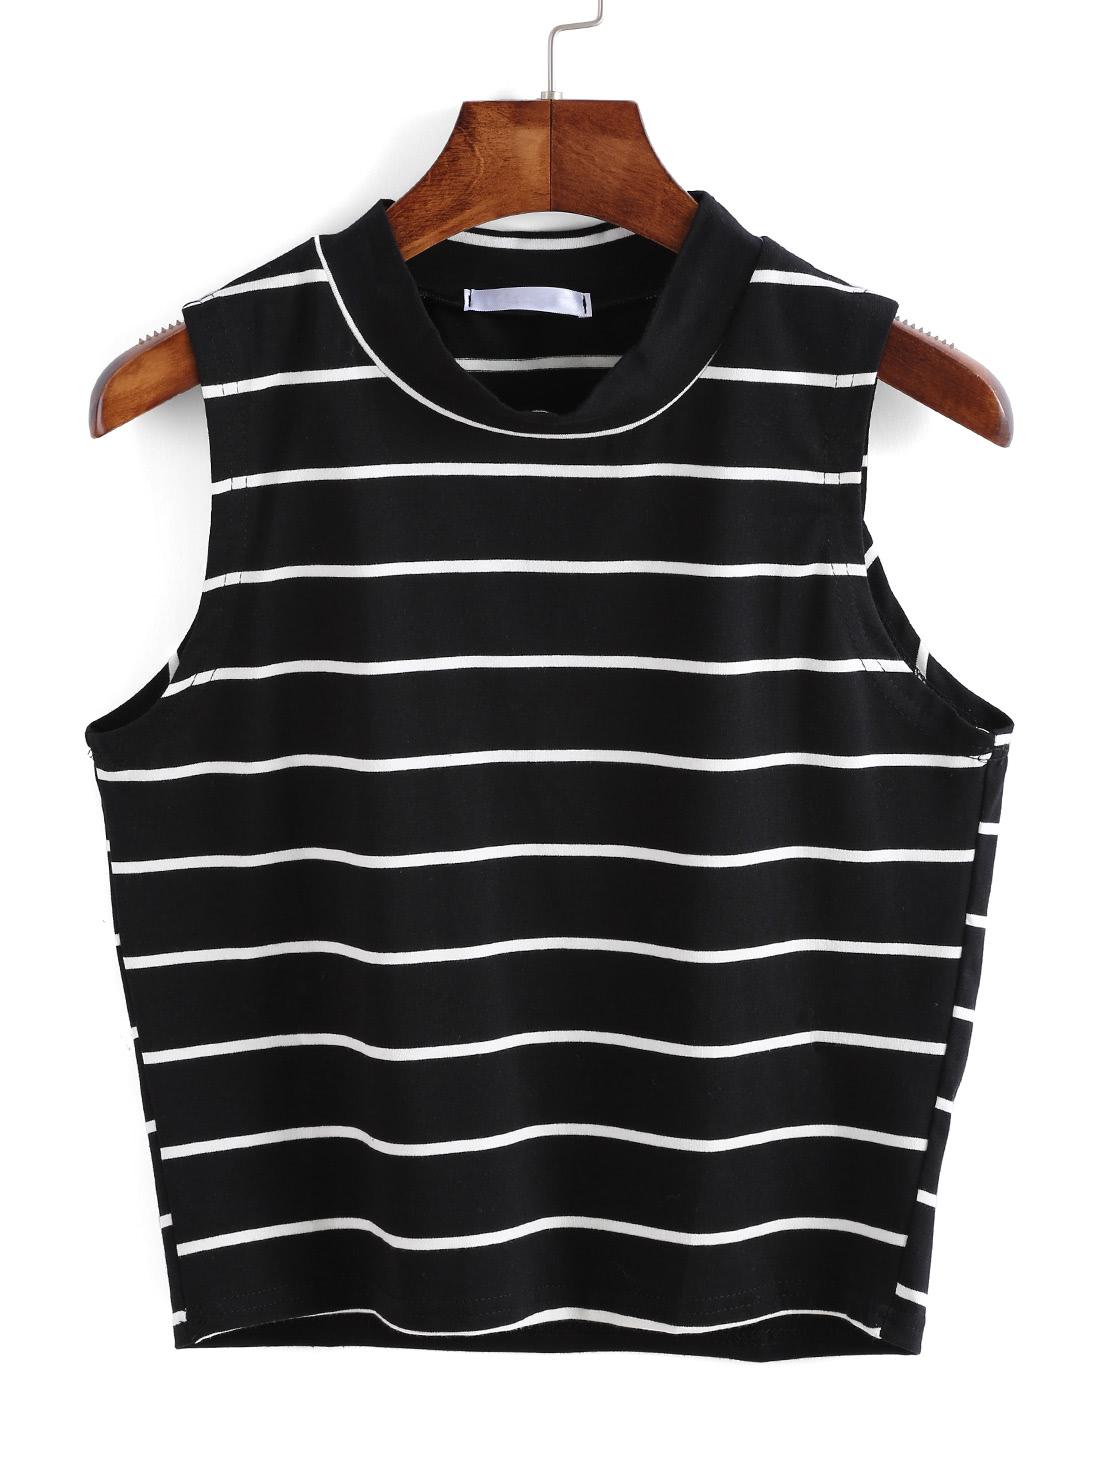 Striped Black Tank Top